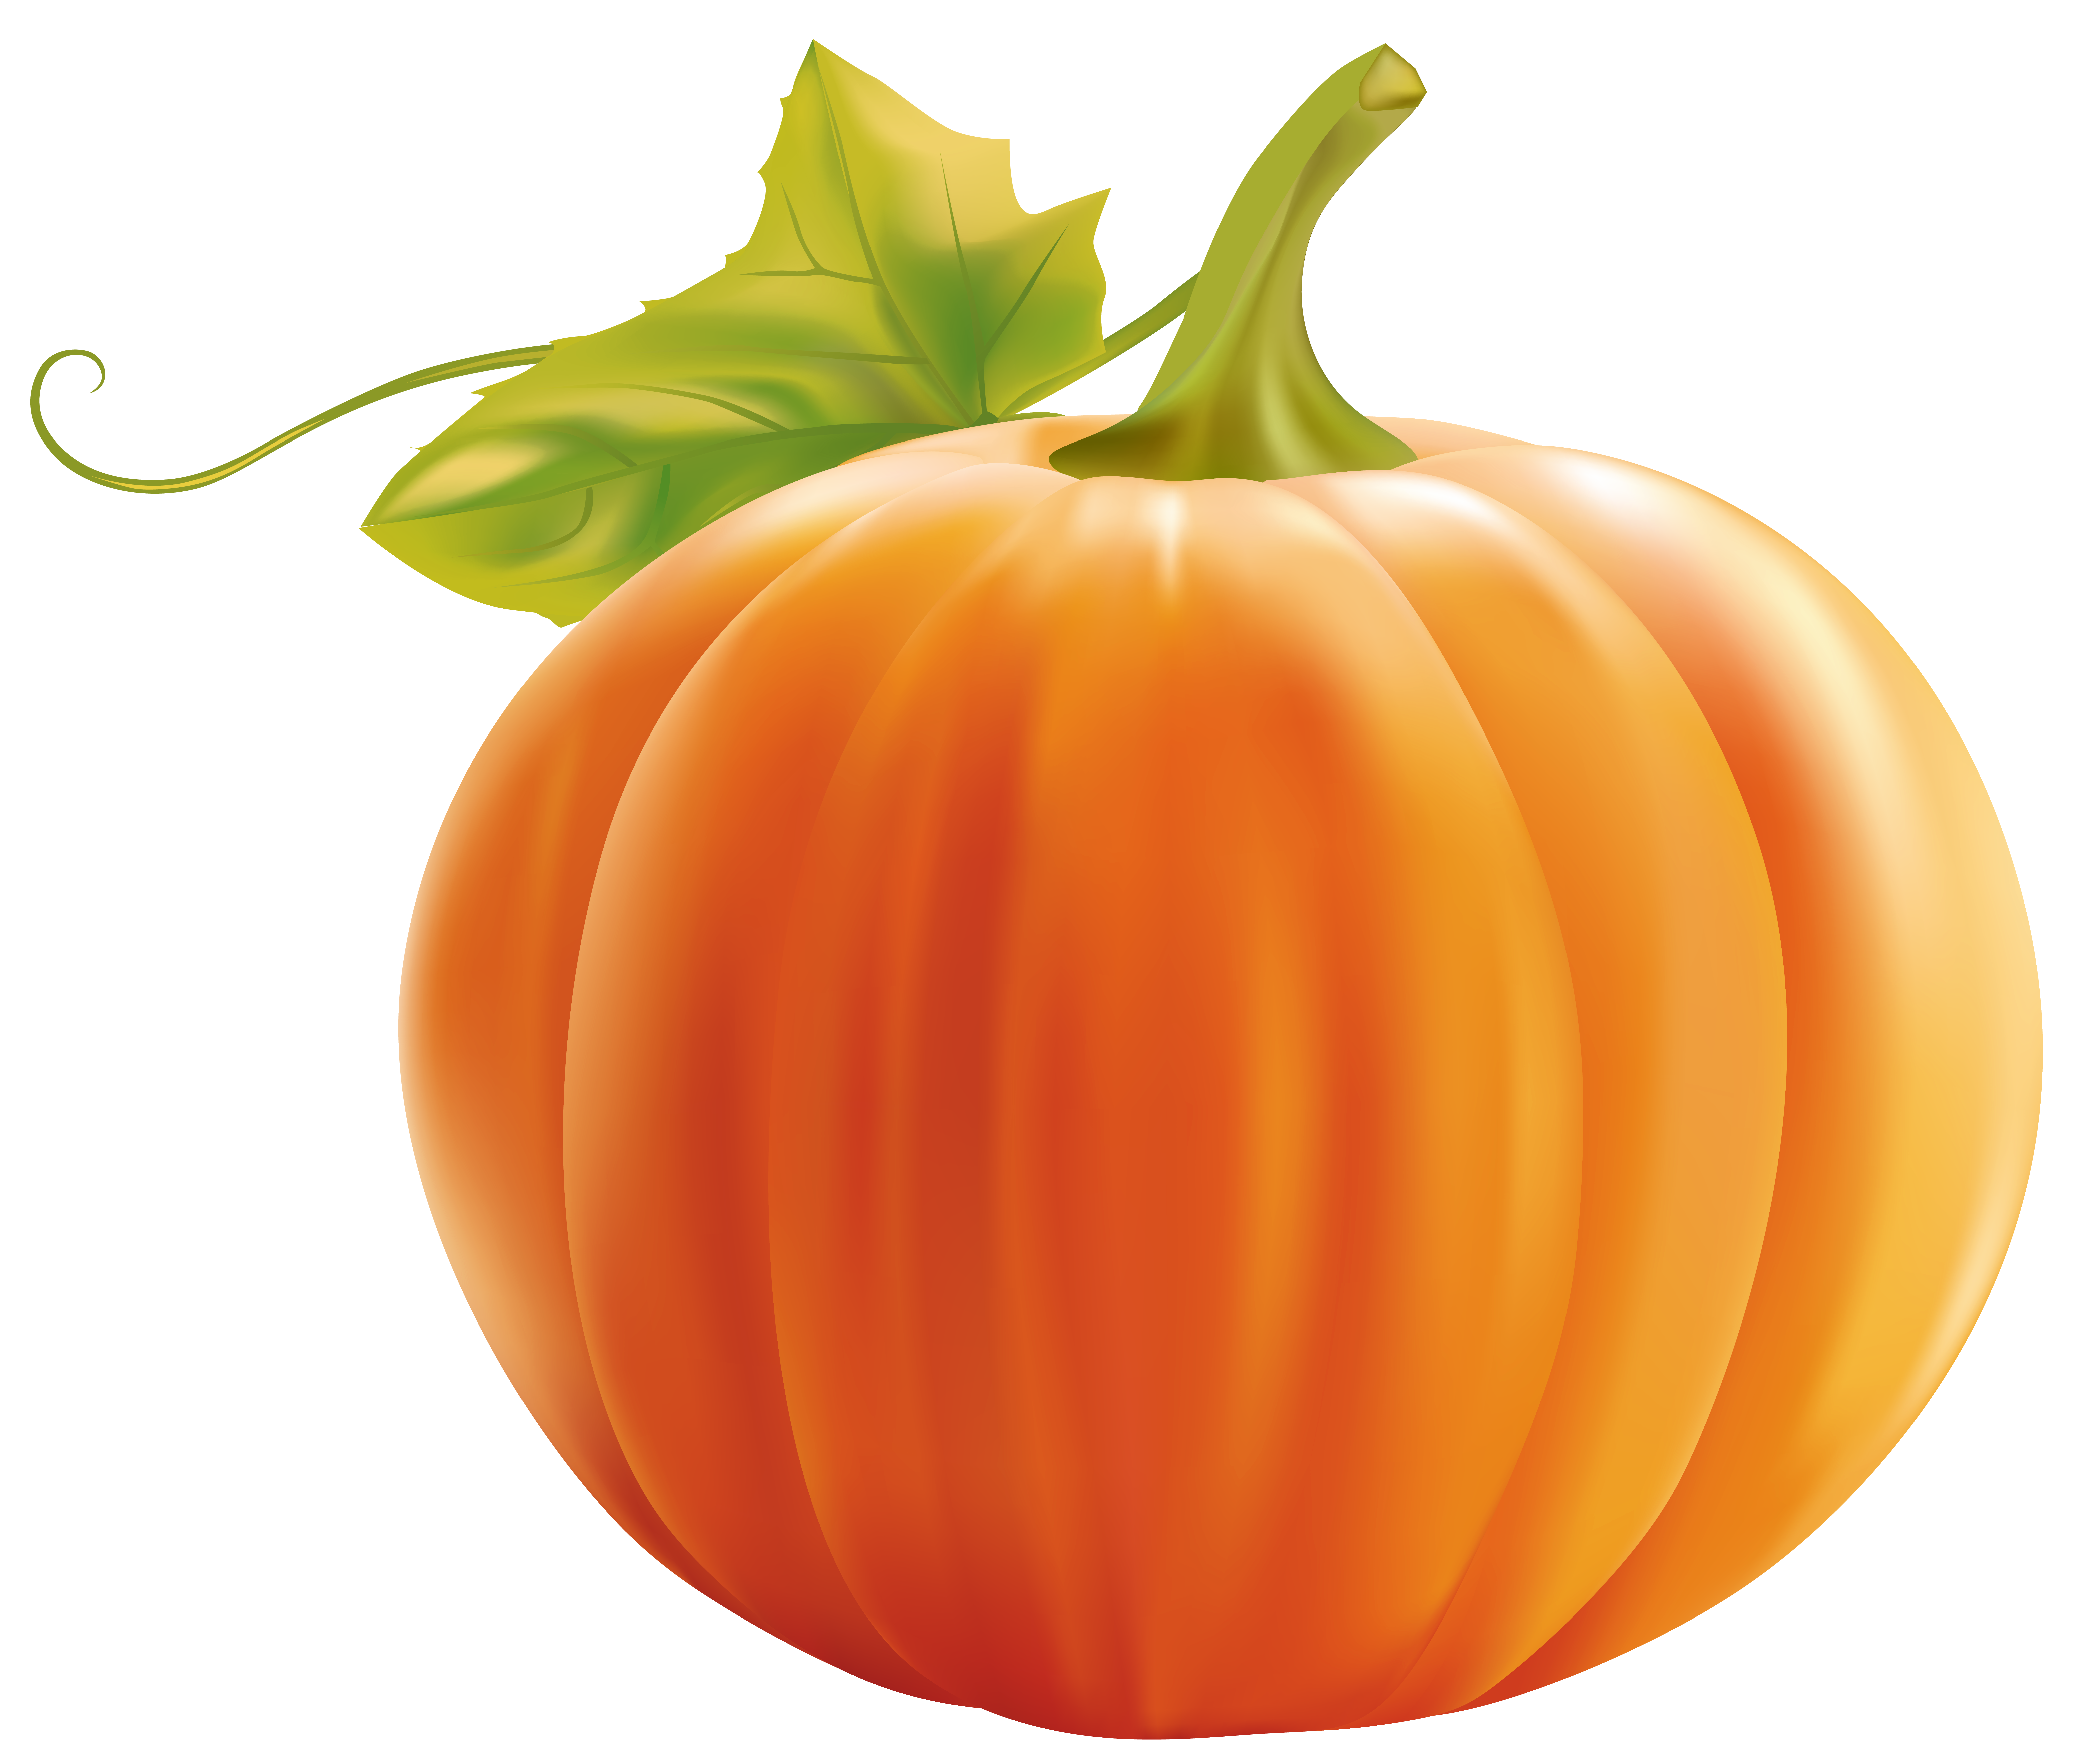 Pumpkin Png Clipart Image Pumpkin Clipart Pumpkin Png Pumpkin